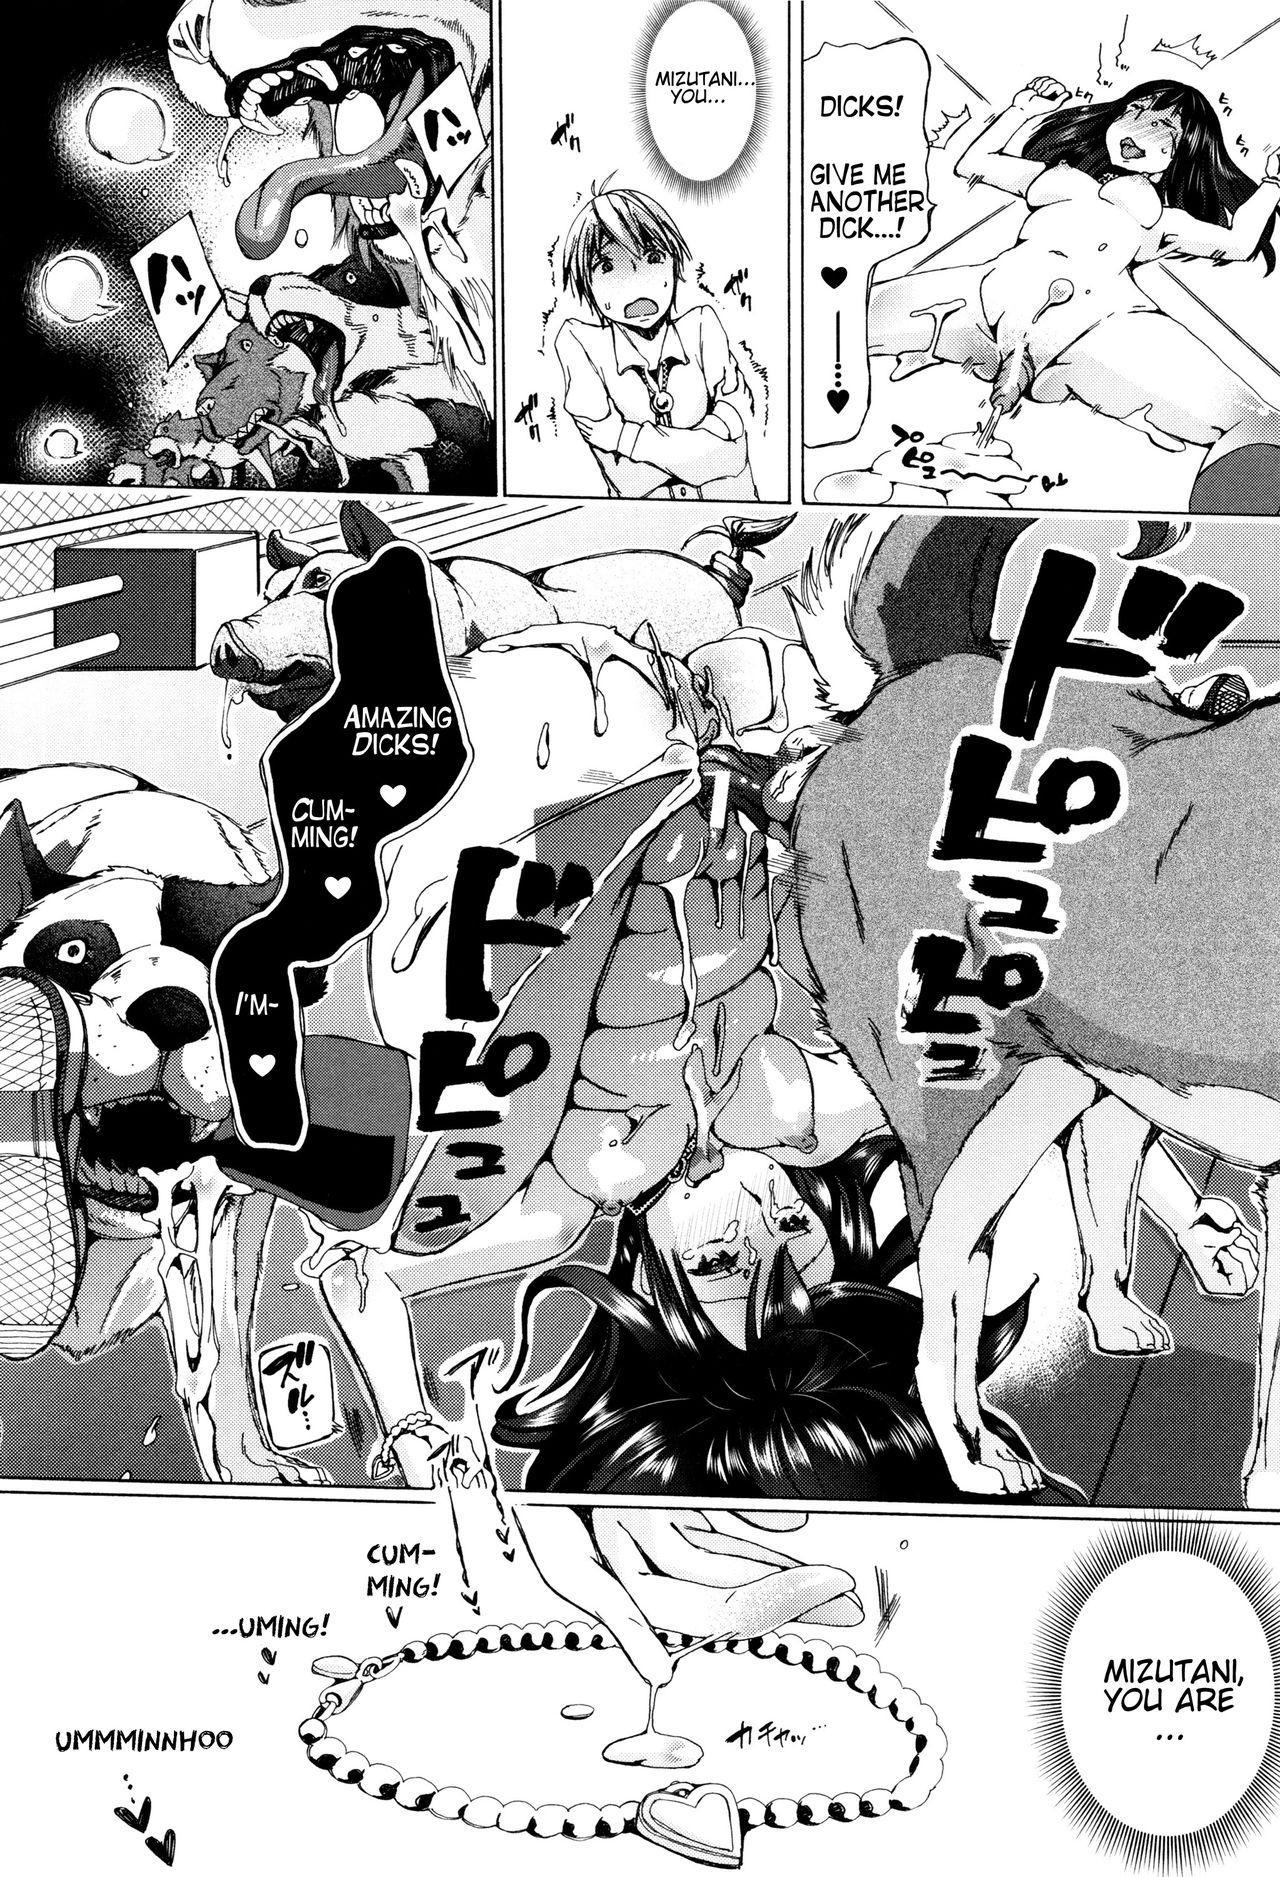 [Chikiko] Juukan Kyoushitsu - Bestiality Classroom Ch. 1-5 [English] [Neeko7] 48